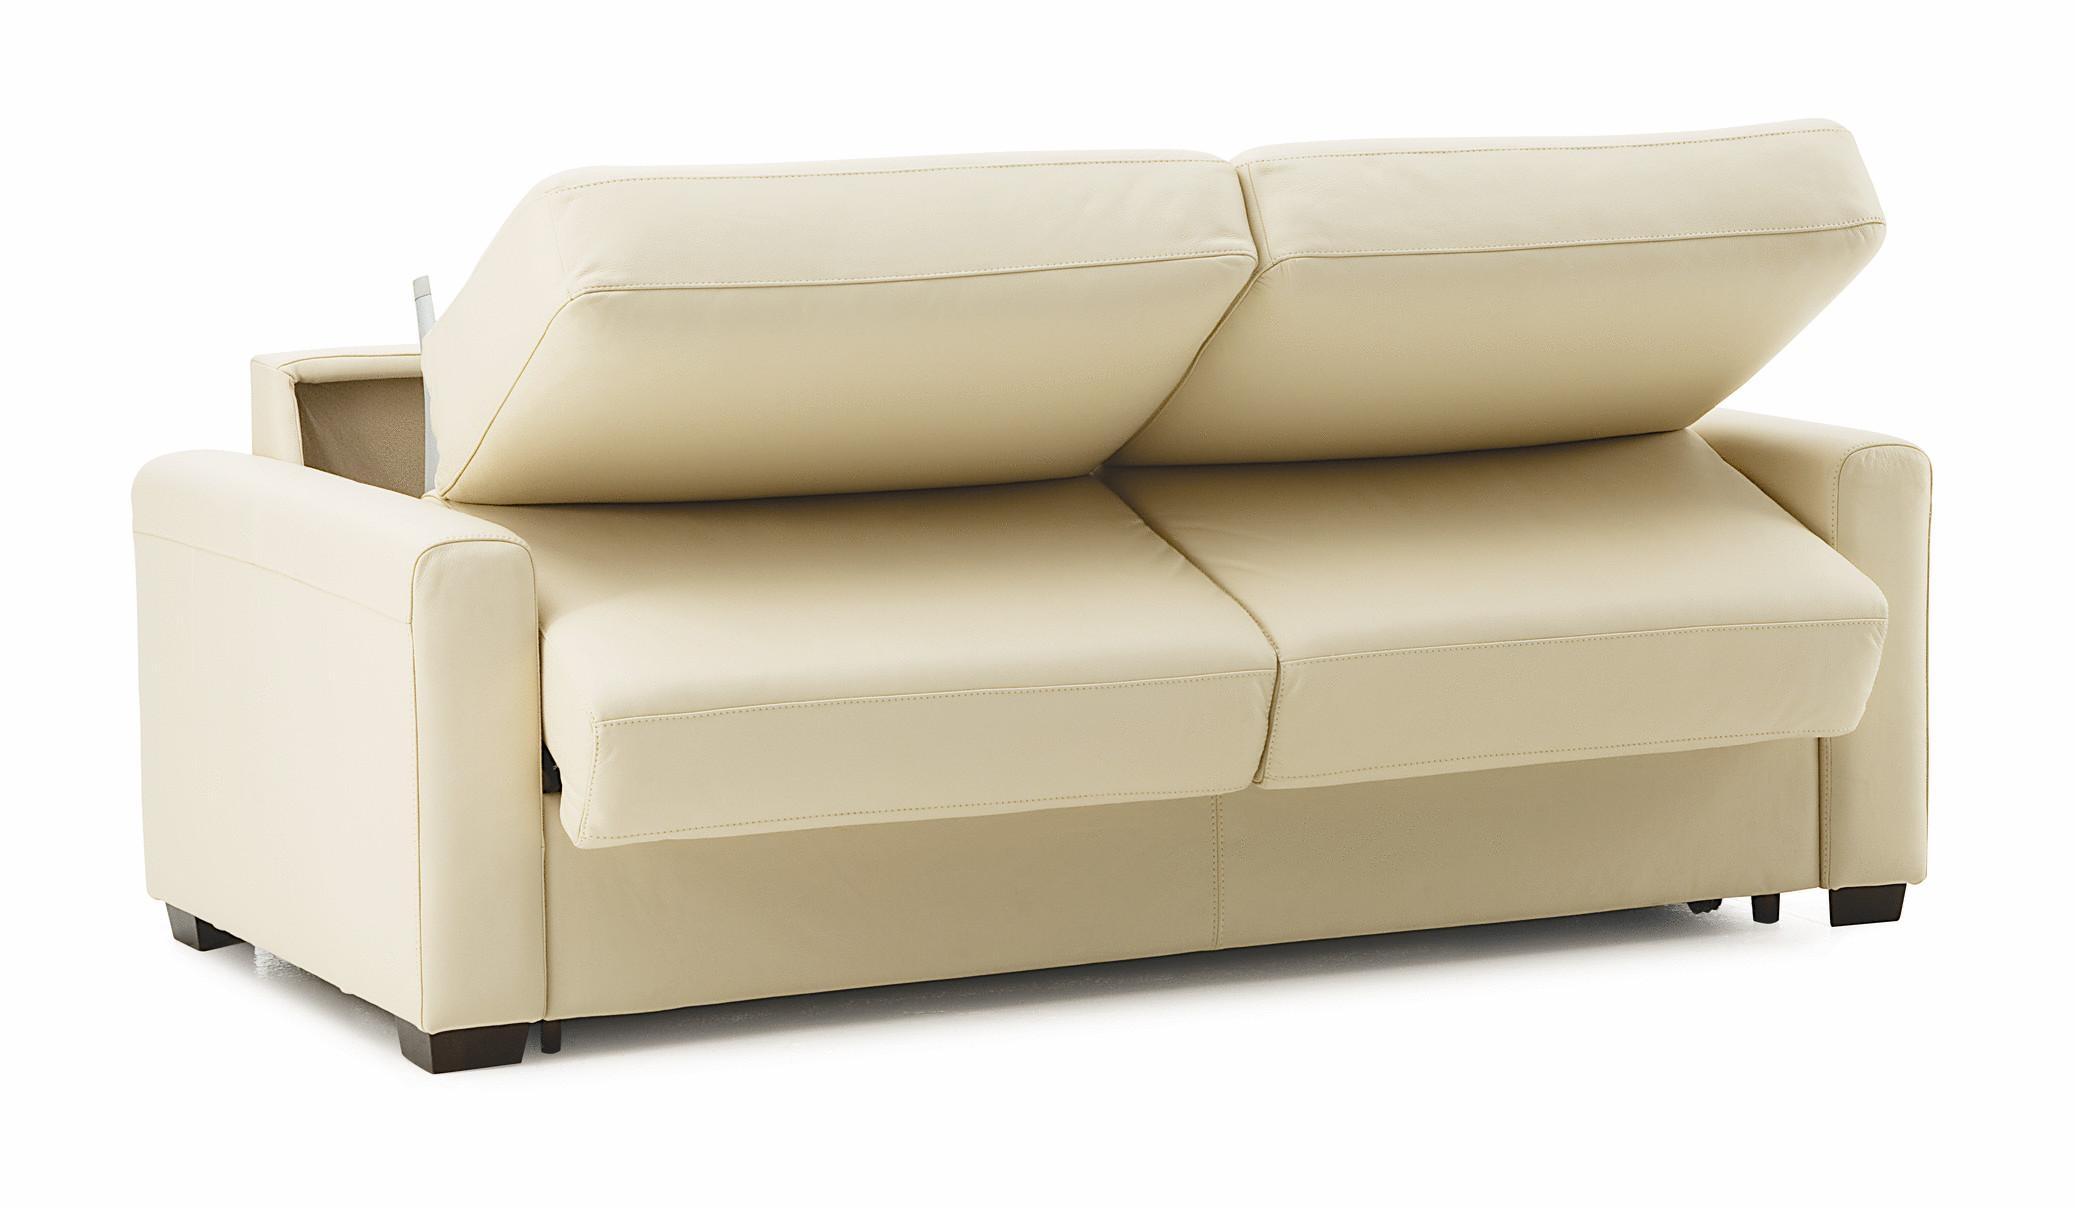 20 ideas of sofa bed sleepers sofa ideas. Black Bedroom Furniture Sets. Home Design Ideas